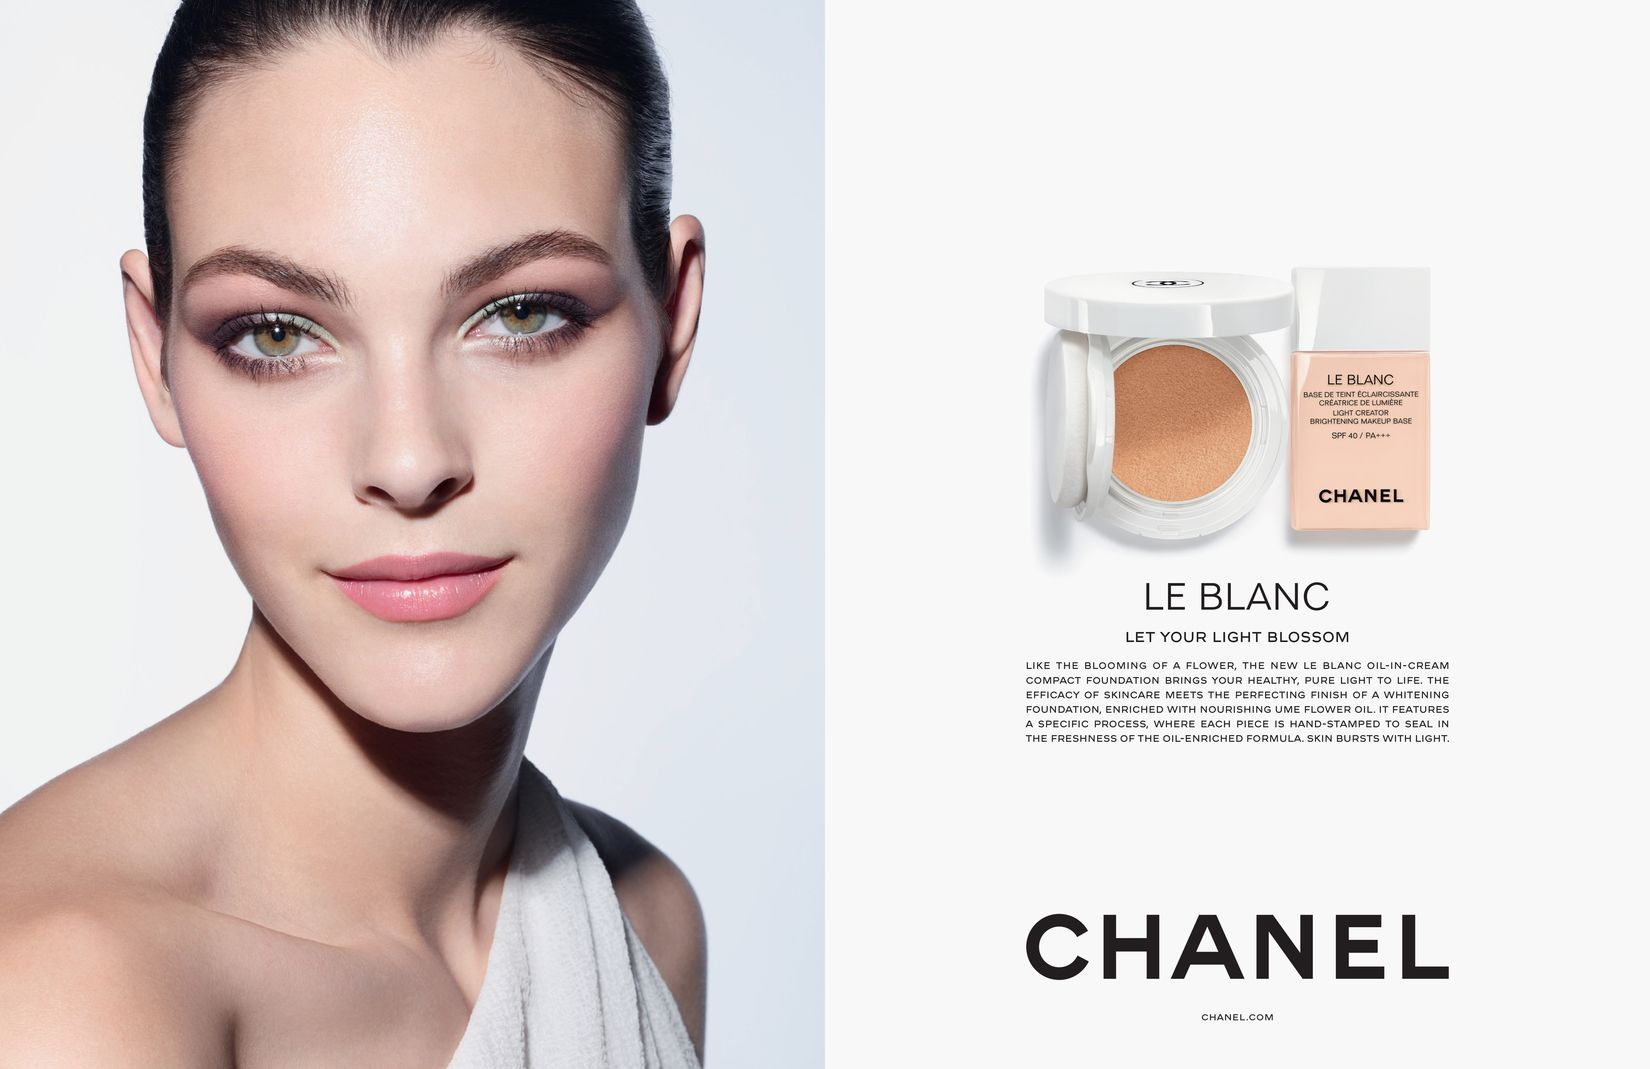 Art Commerce Artists Photographers Solve Sundsbo Advertising Beauty Photography Chanel Beauty Photographer